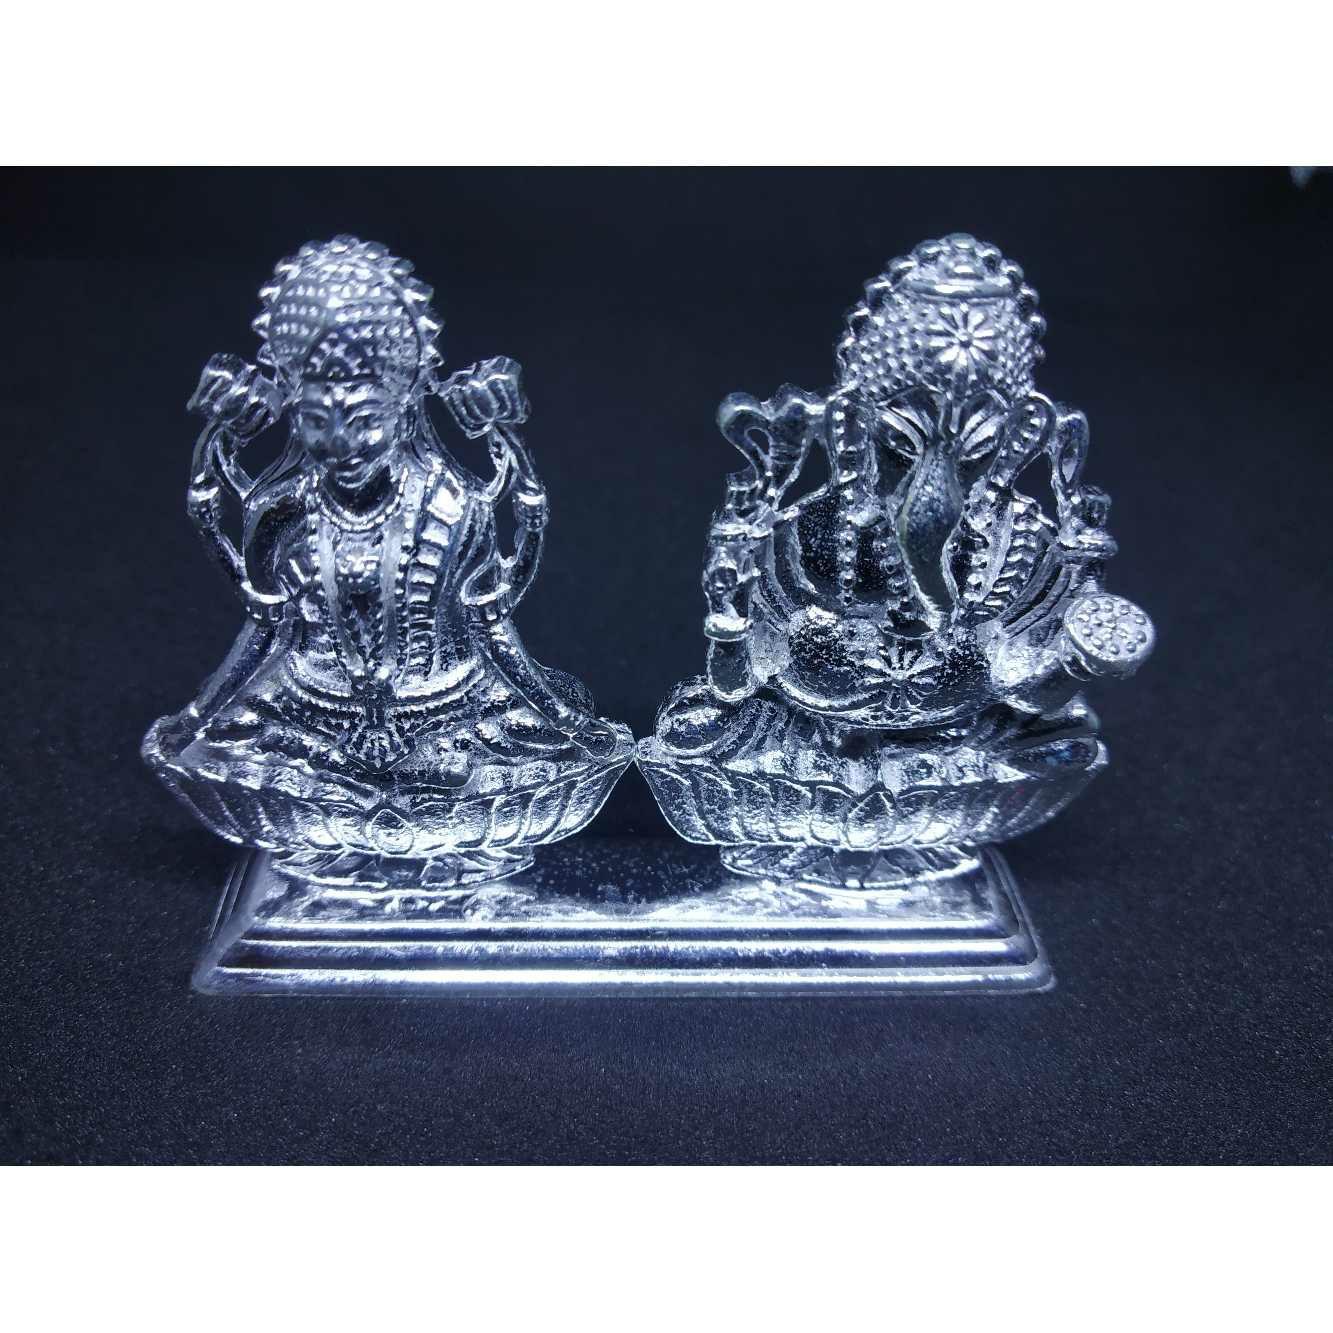 Laxmi-ganesh joint antique waks casting murti(bhagvan,god)